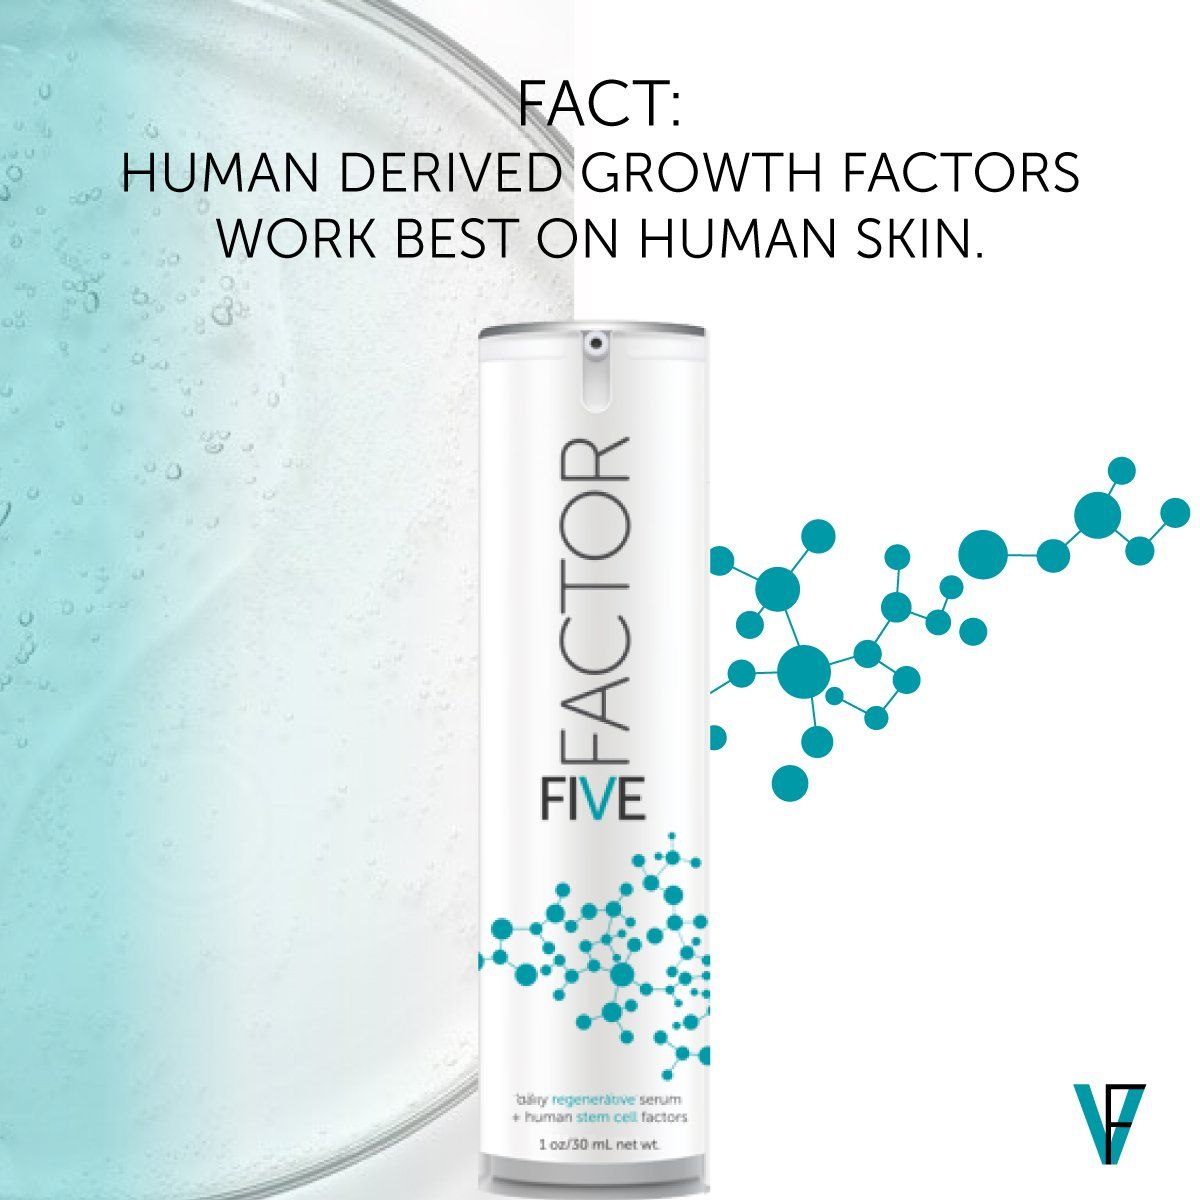 Factorfive Factorfiveskin Twitter Stem Cell Skin Care Skincare Store Plant Stem Cell